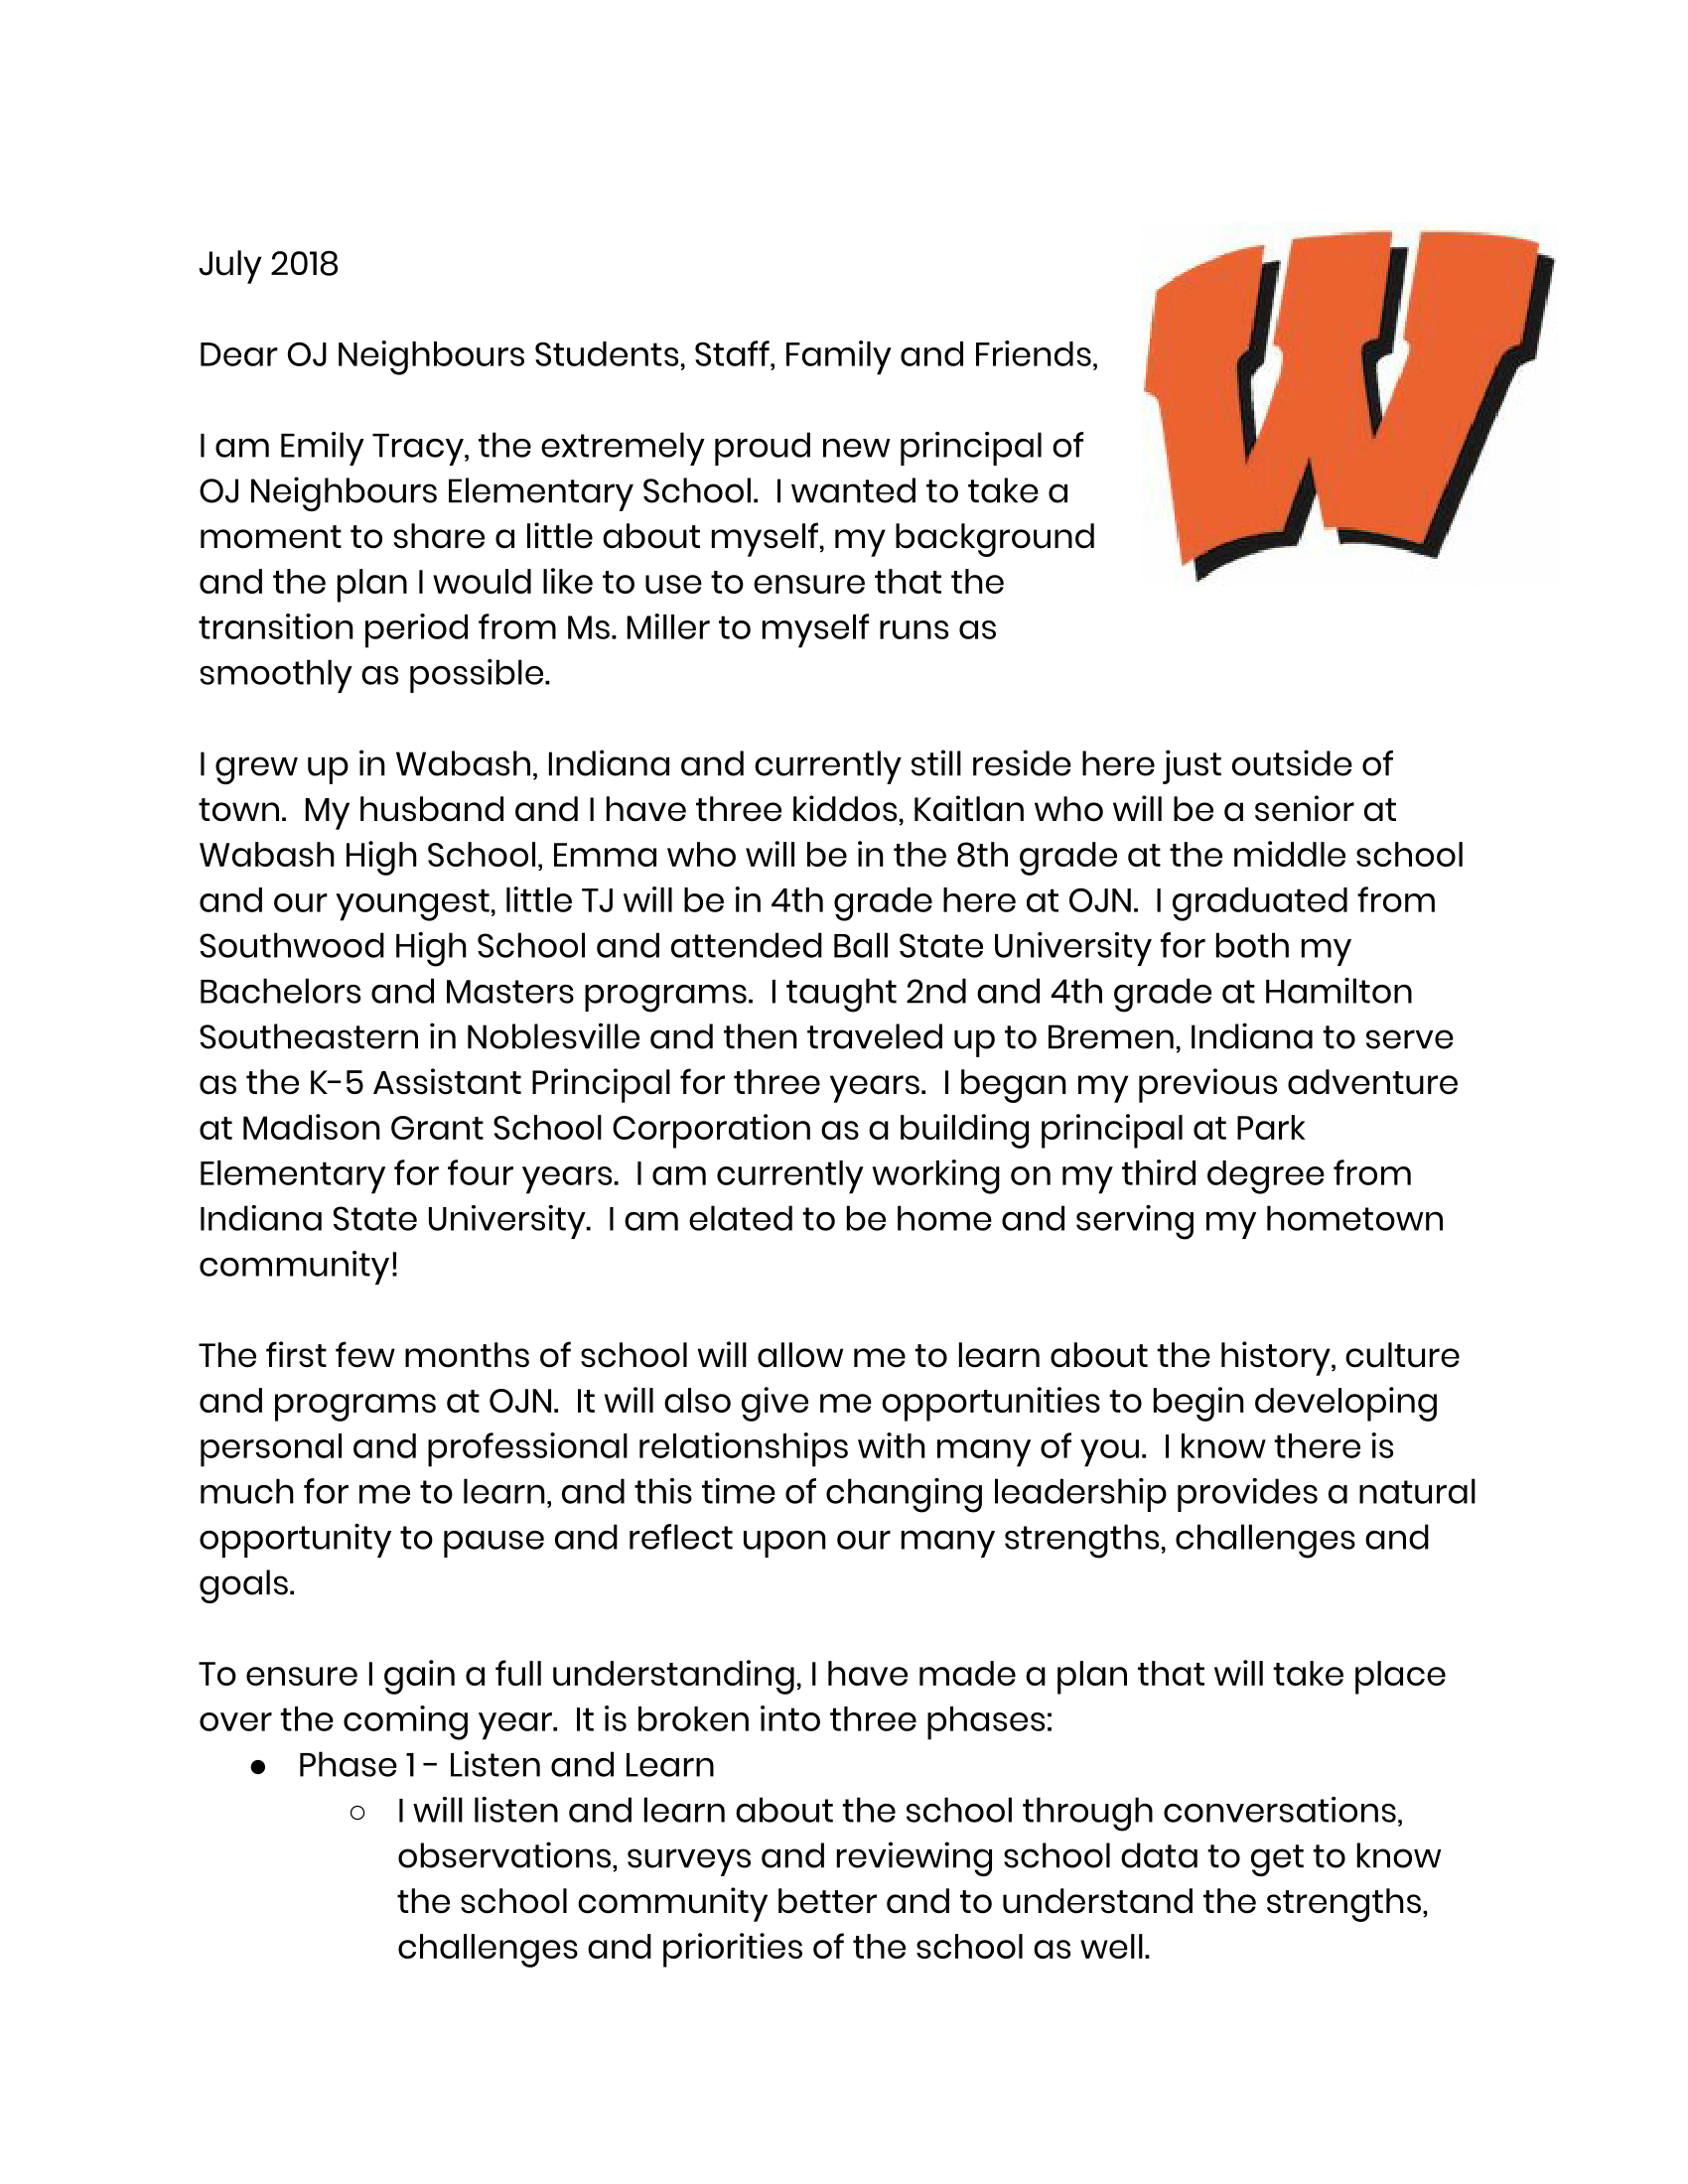 Principal's Message page 1